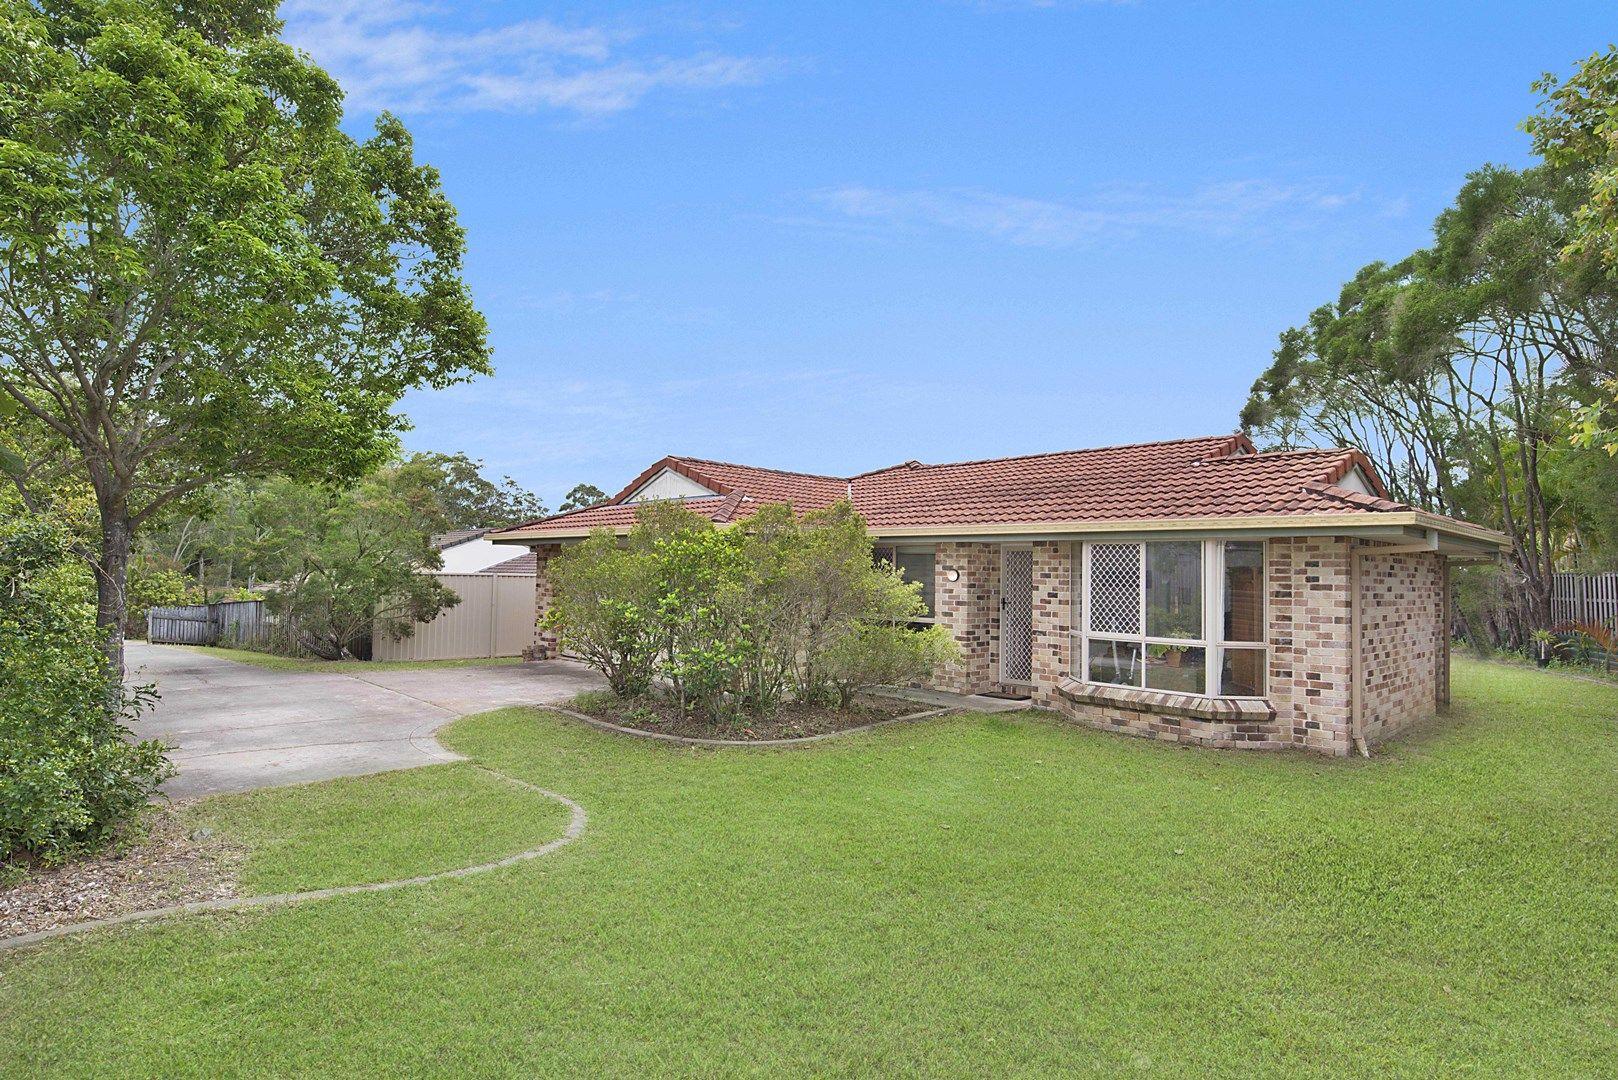 9 Satinwood  Street, Noosaville QLD 4566, Image 0